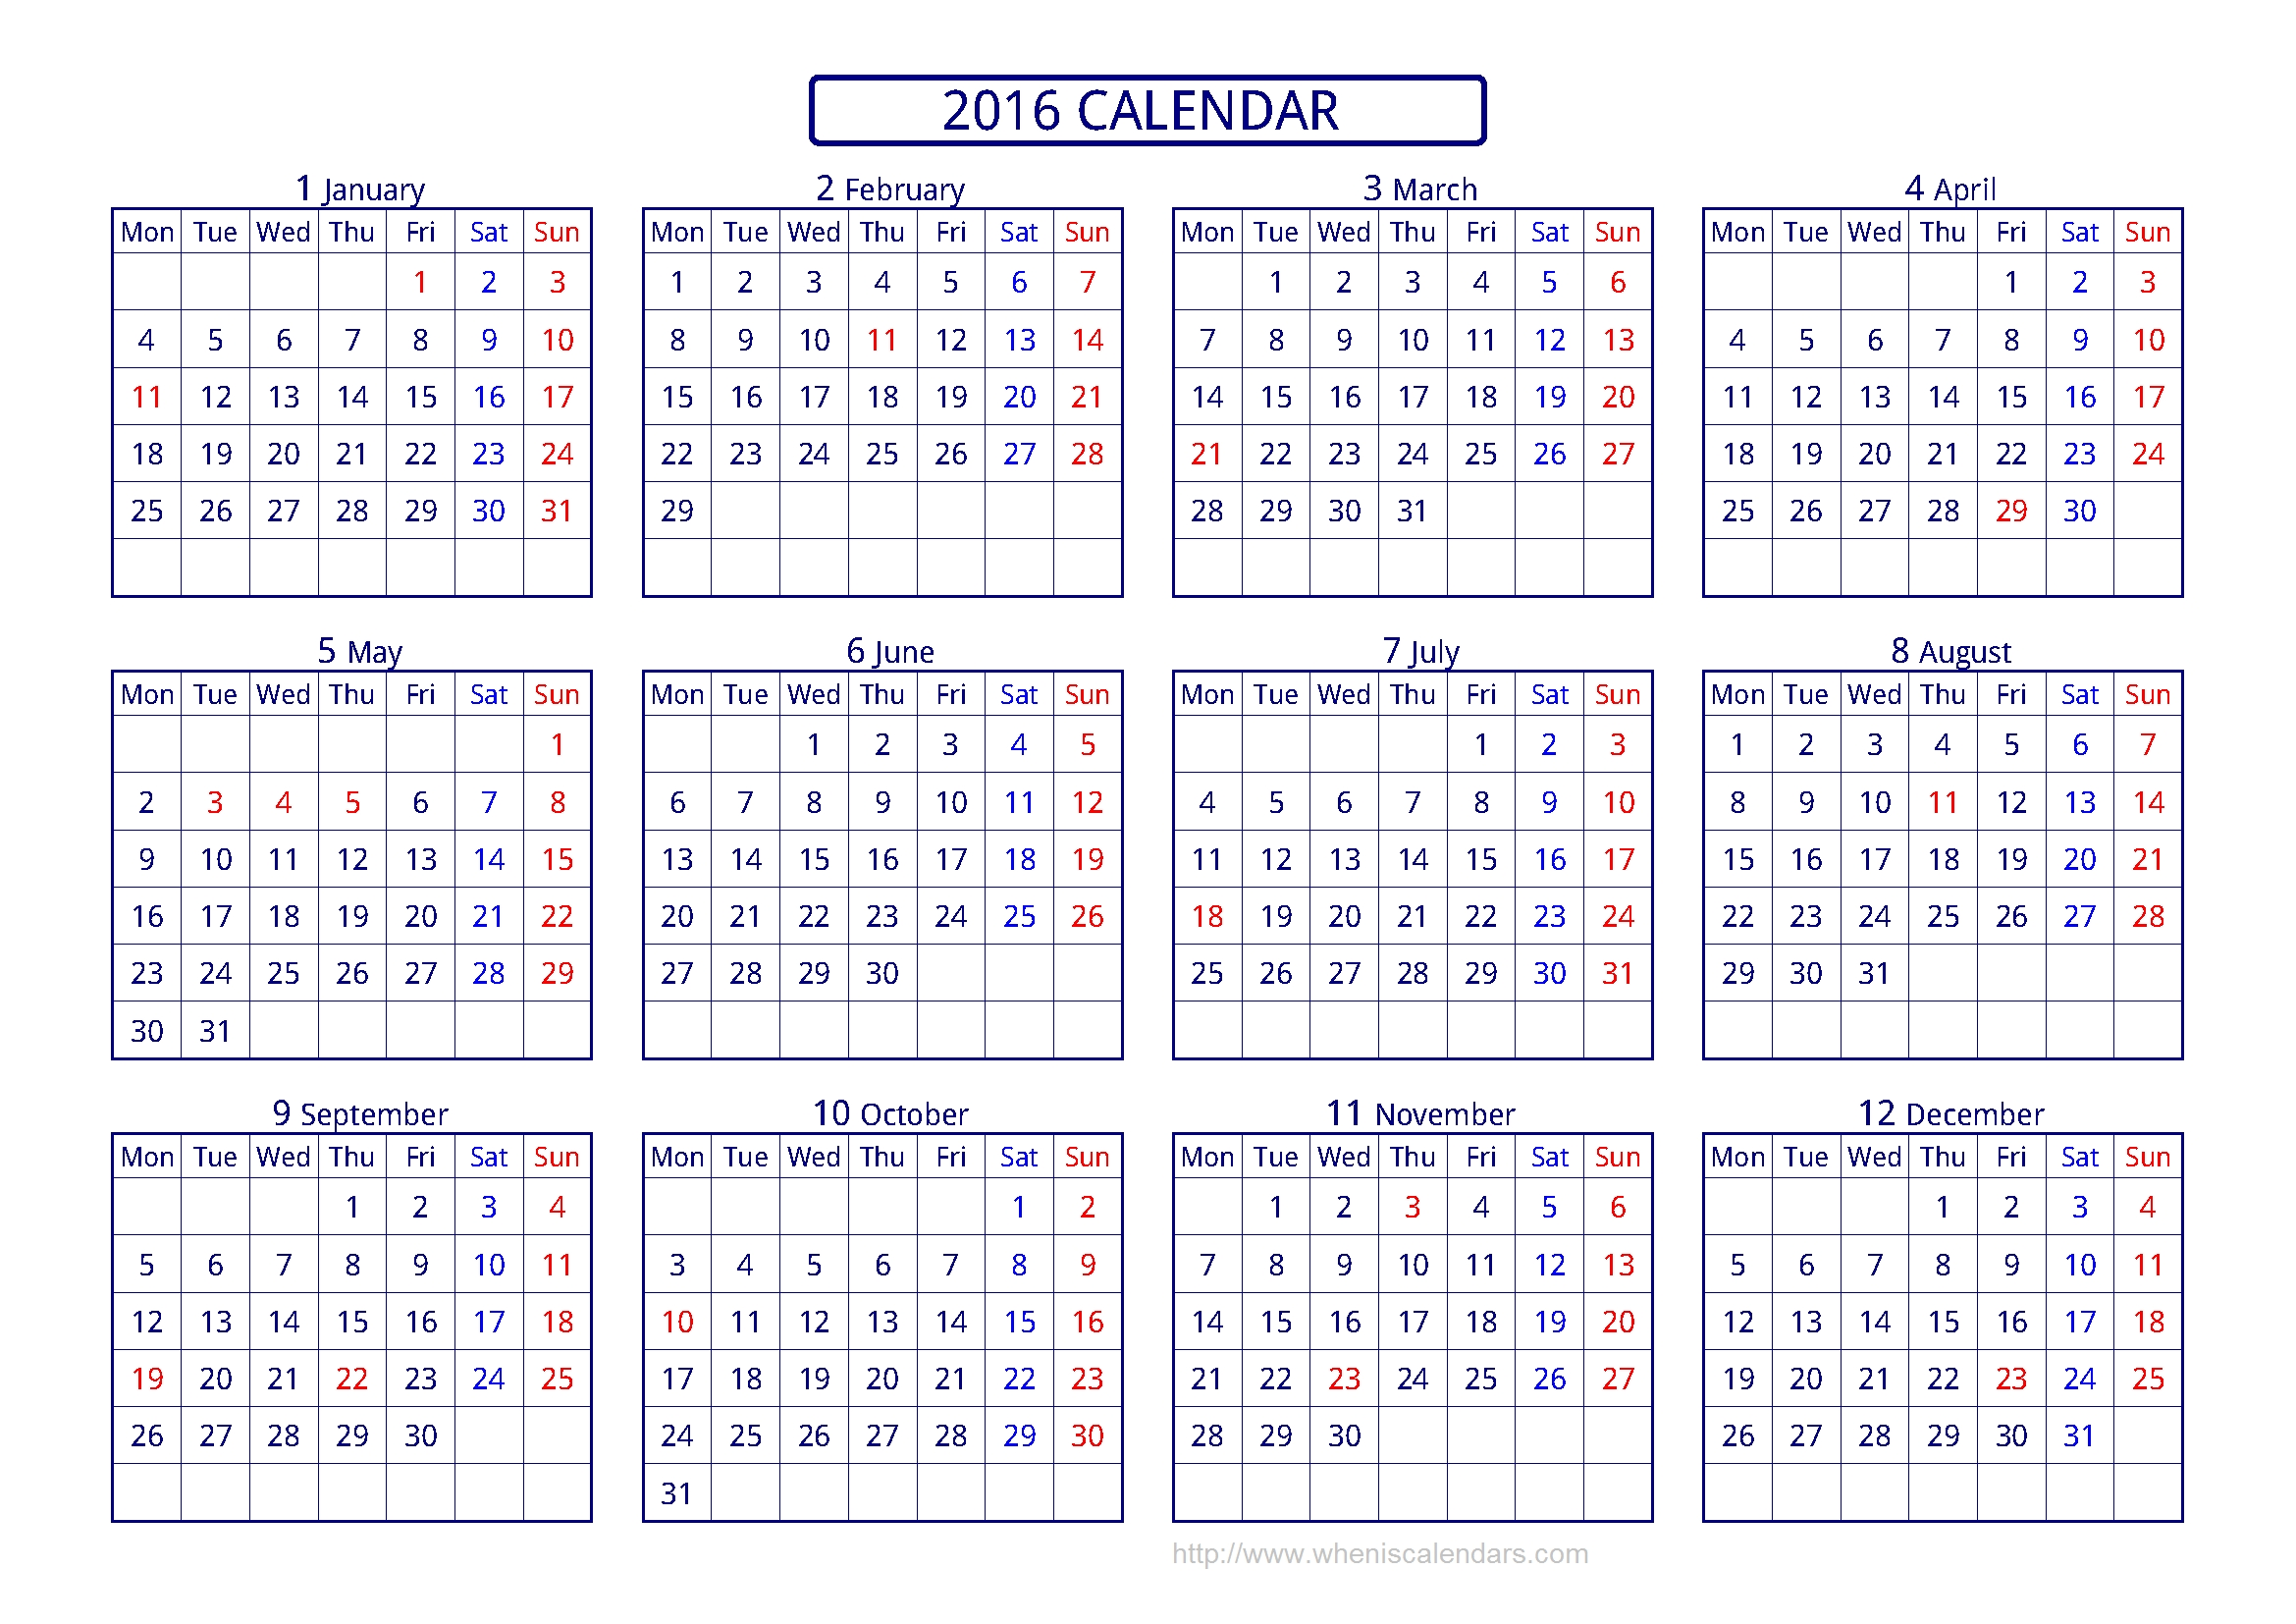 Calendar 2016 Template Printable Pdf & Image (10 Templates)